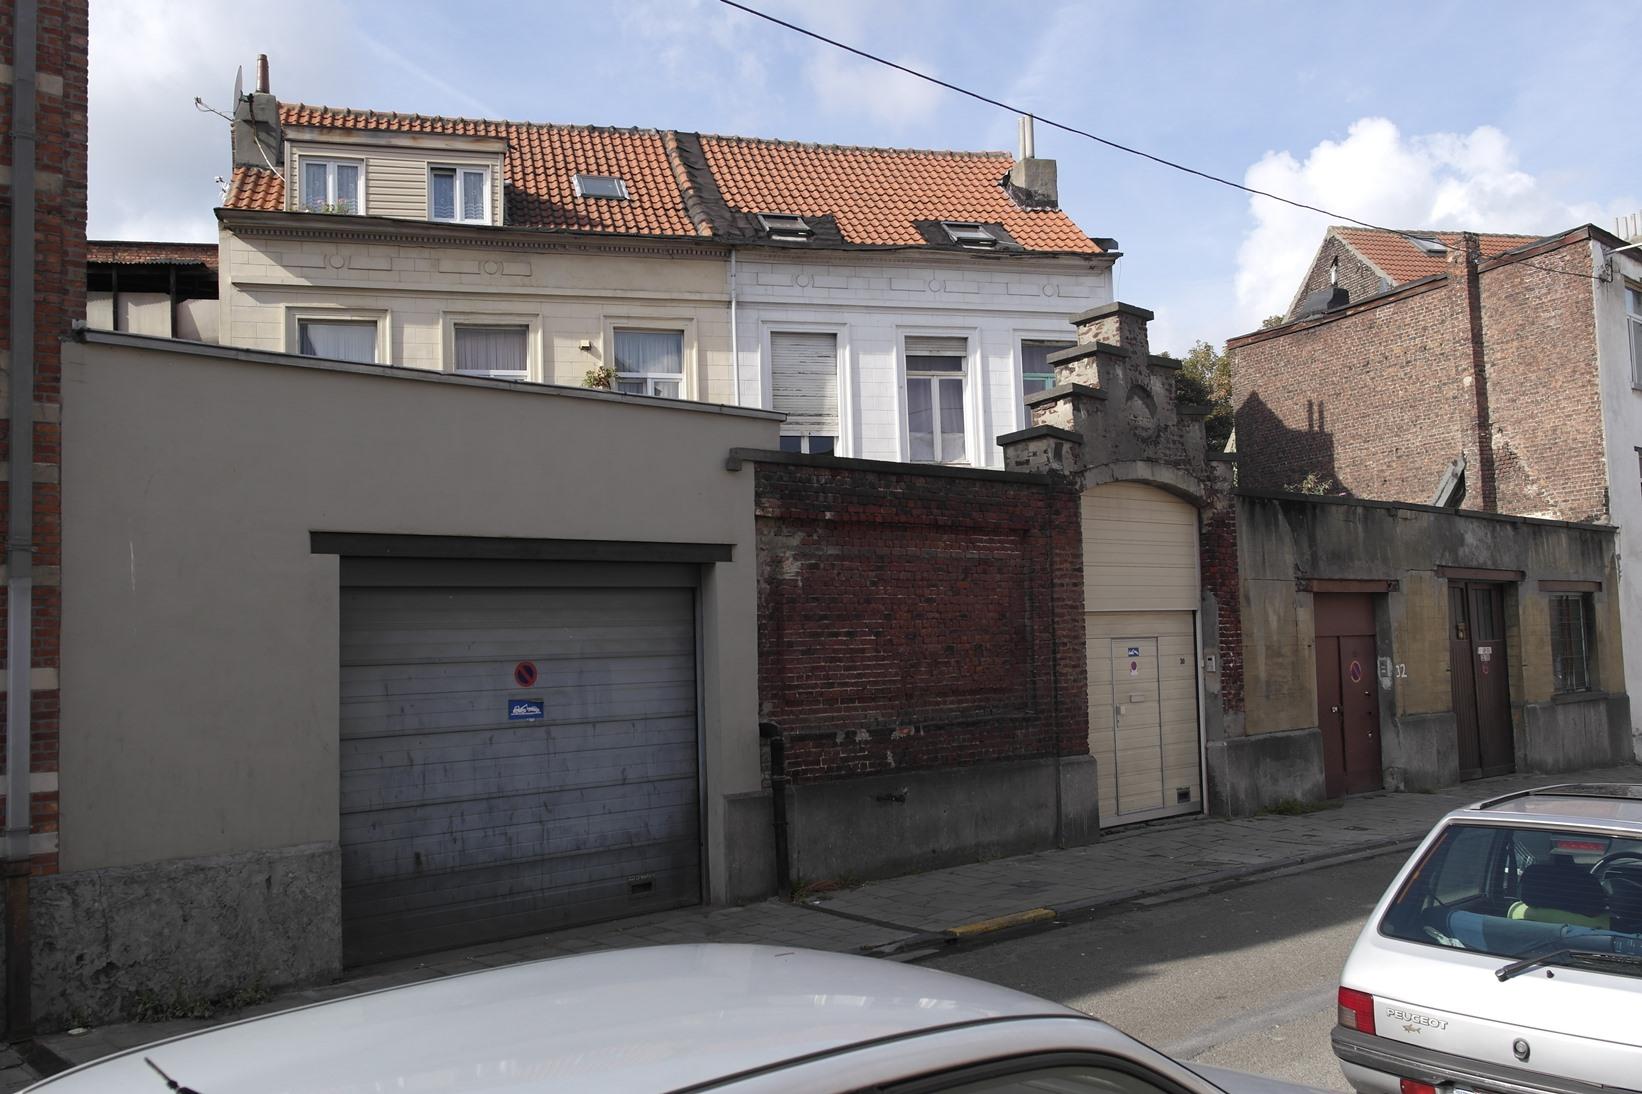 Engelenbergstraat 30, 32, 2014